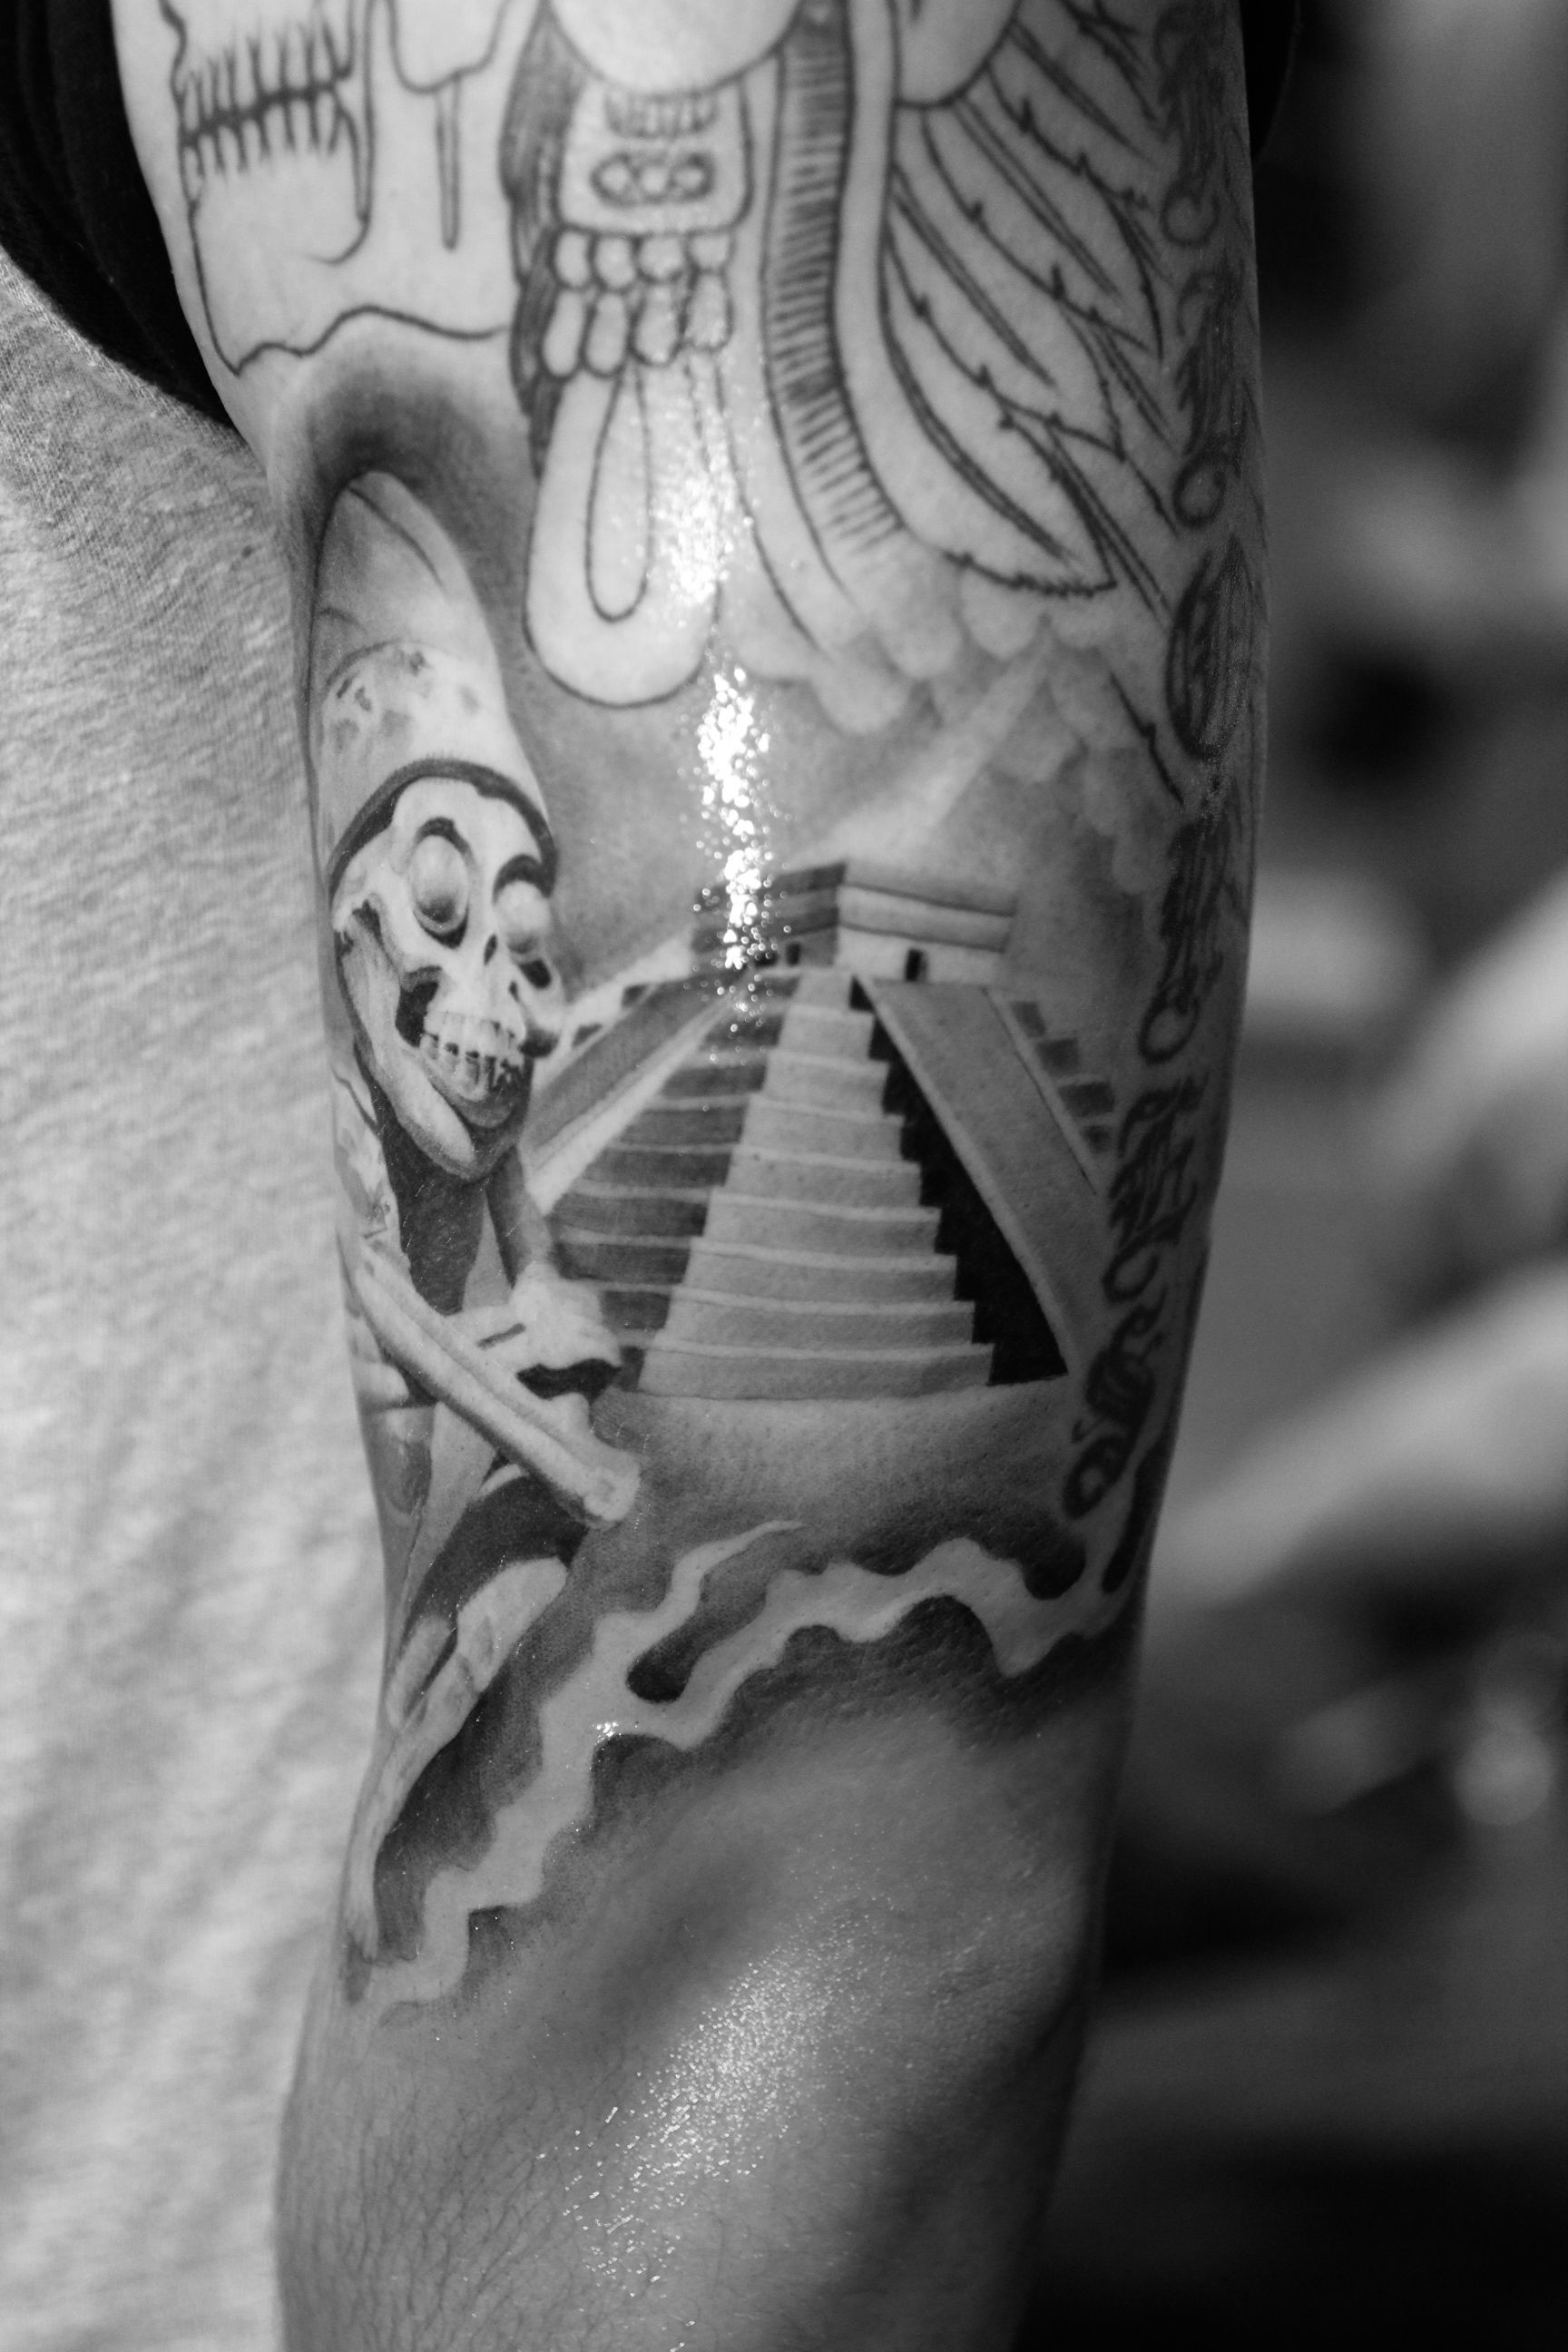 Aztec Tattoos Design Ideas For Men and Women | More Aztec ... Aztec Calendar Sleeve Tattoos